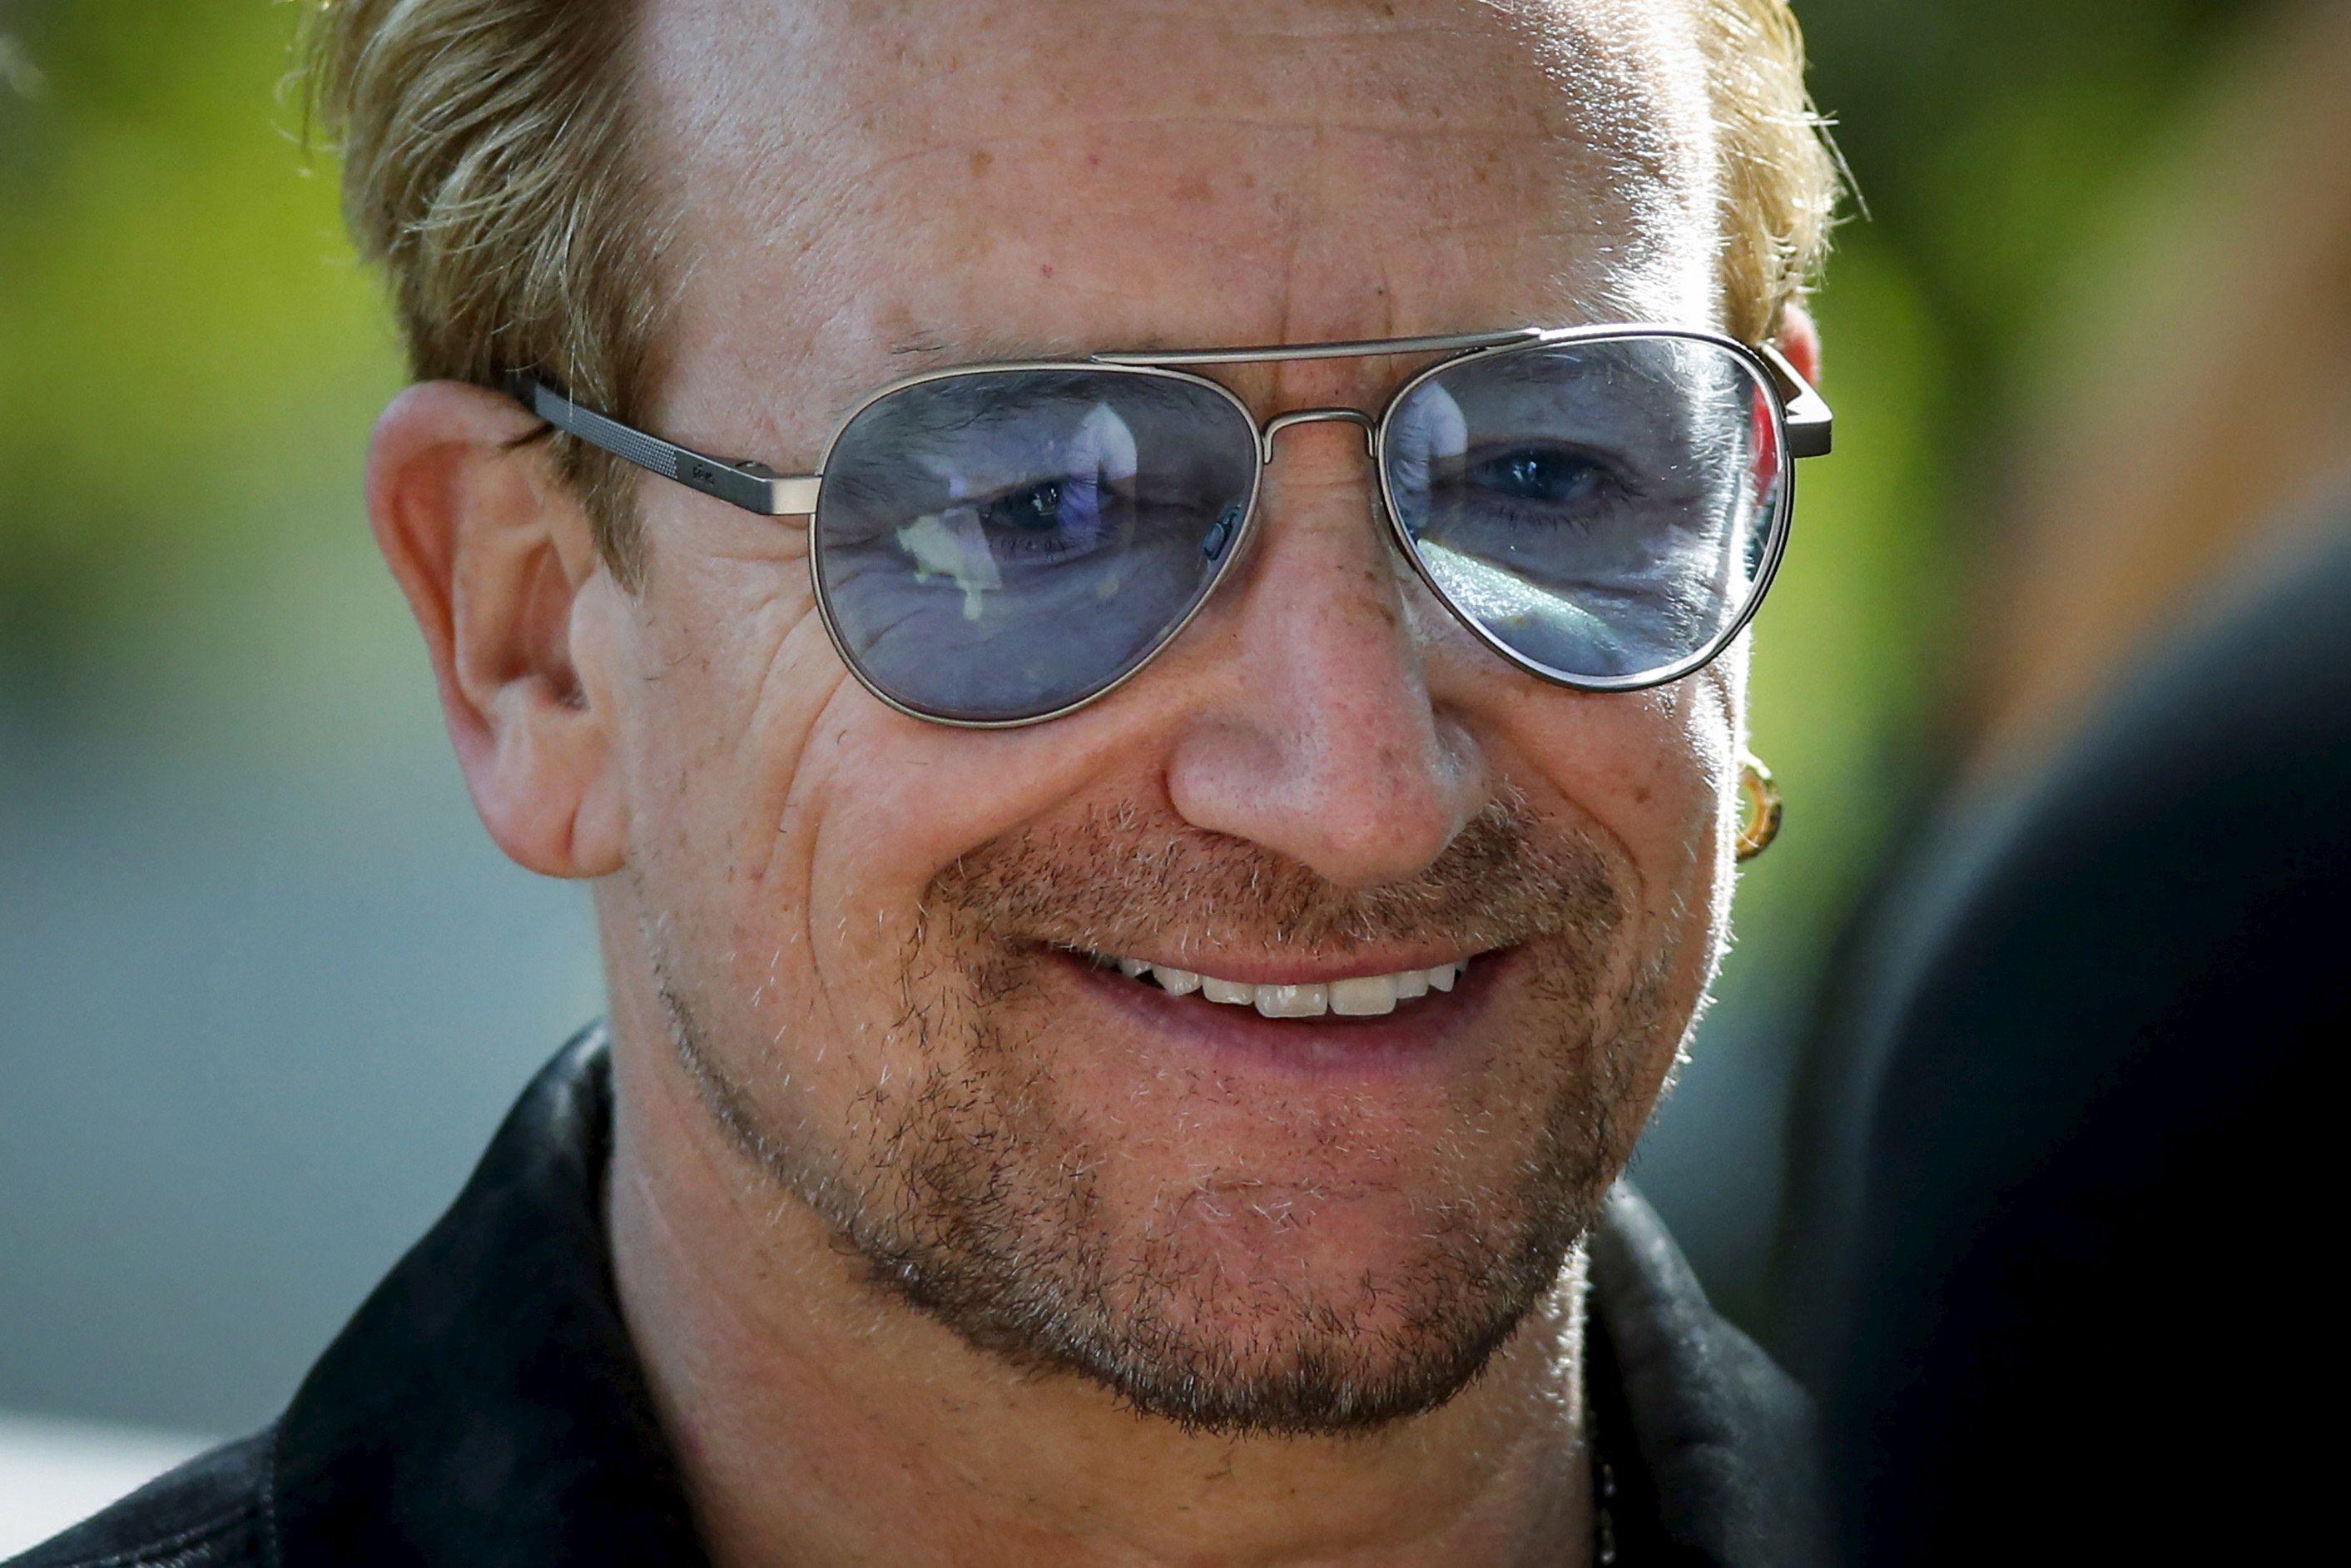 Irish singer Bono attends the unveiling of a tapestry honoring John Lennon at Ellis Island in New York July 29, 2015. REUTERS/Eduardo Munoz